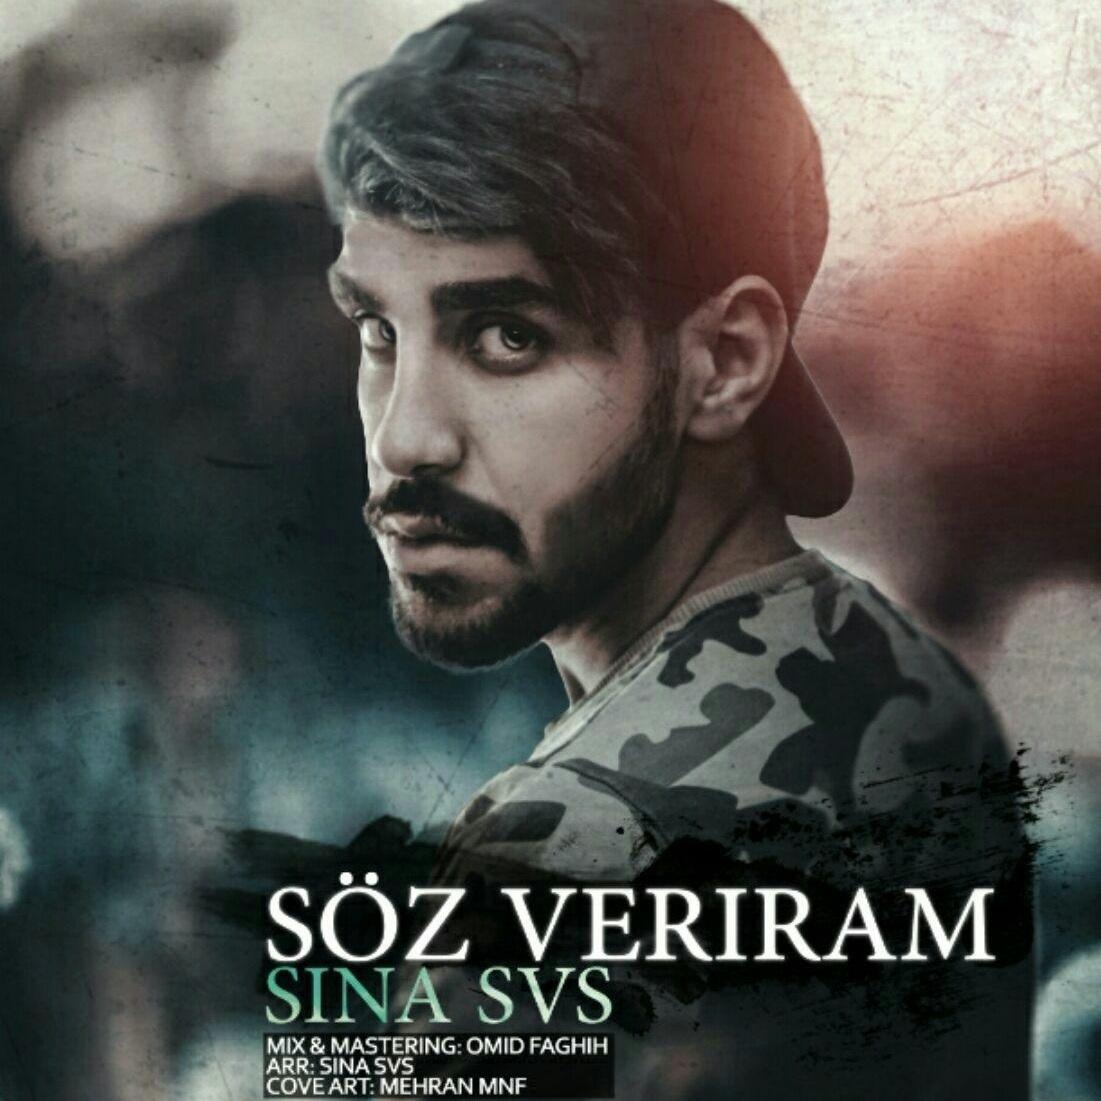 http://birtunes.ir/wp-content/uploads/2018/10/Sina-Svs-Soz-Veriram.jpg